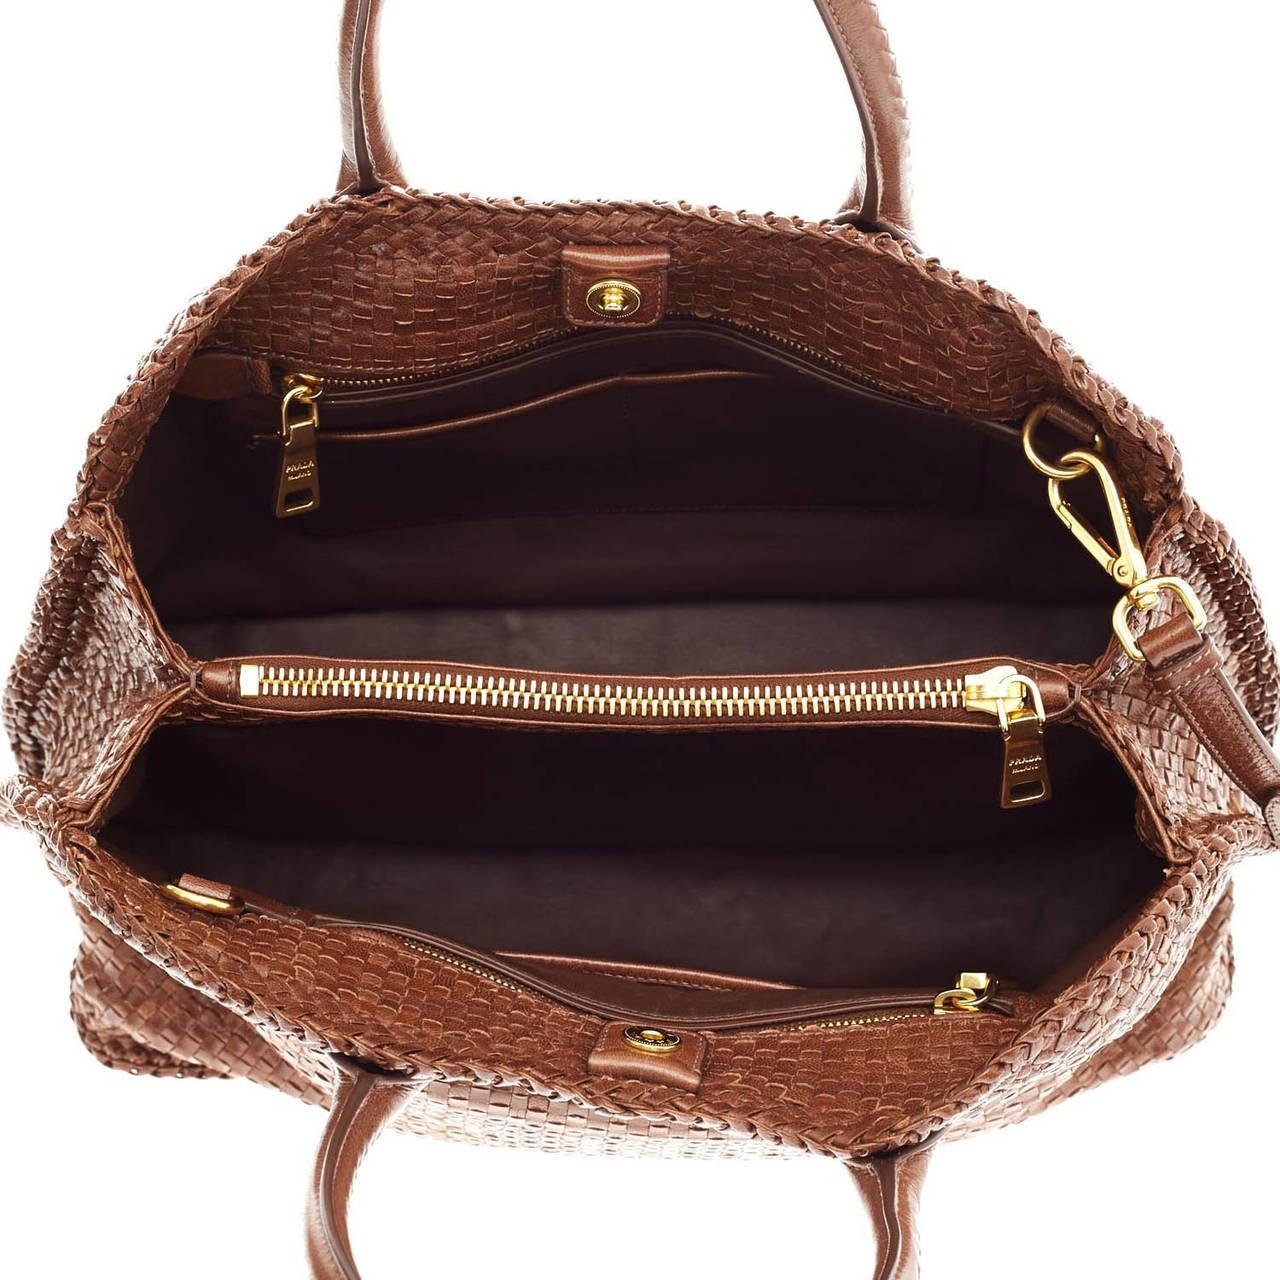 prada leather madras bag prada mens messenger bag sale. Black Bedroom Furniture Sets. Home Design Ideas